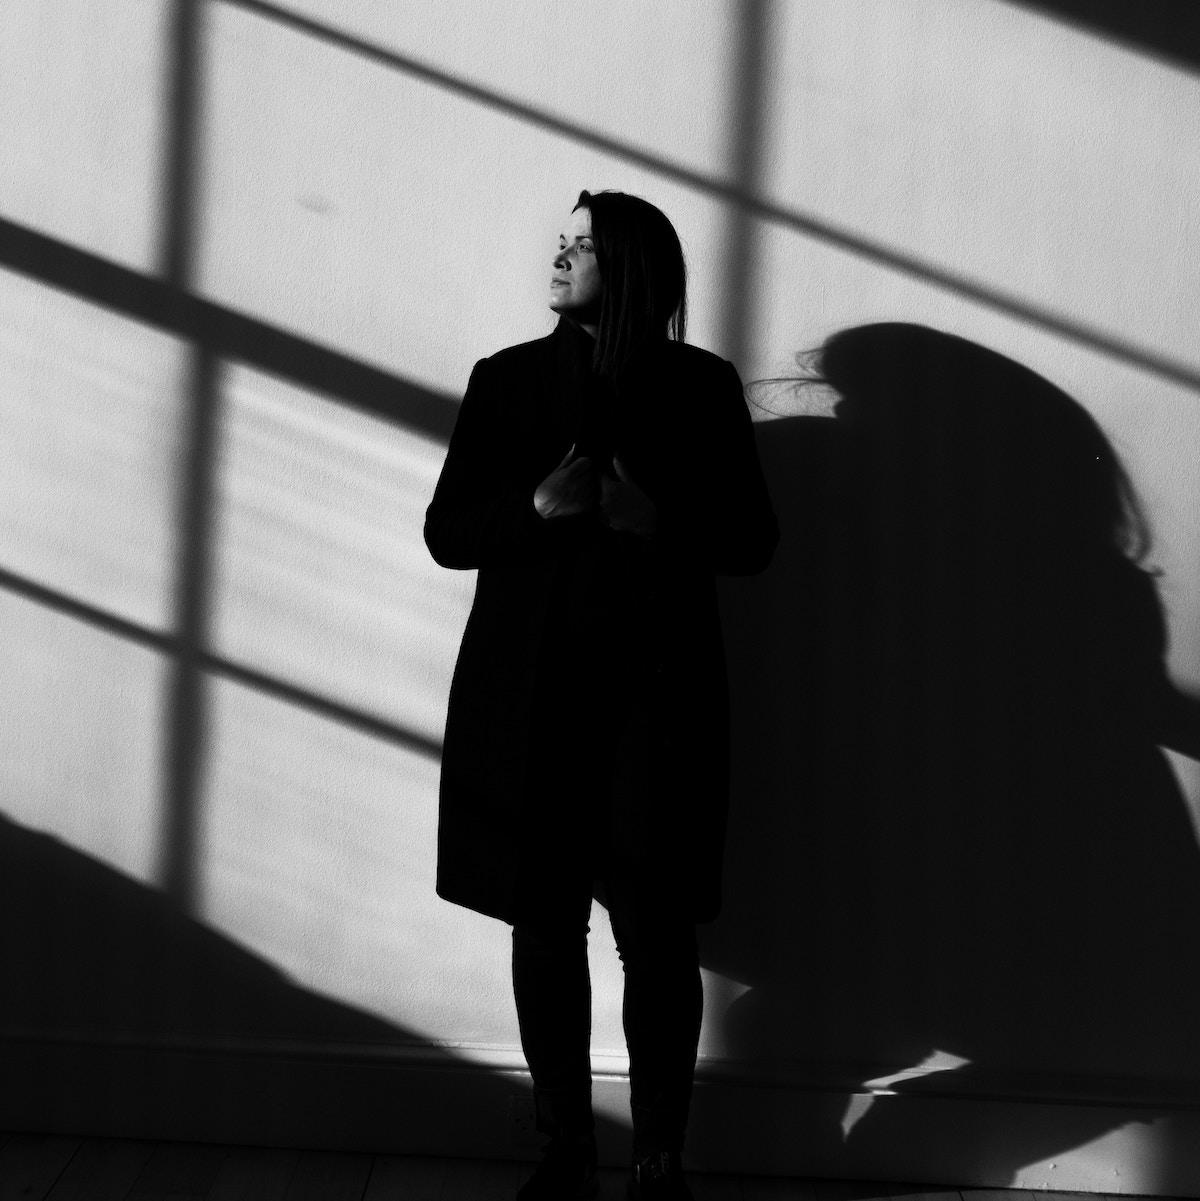 Steps Boosting Mental Health: Flipboard: Improving Care For Bipolar Disorder: Meeting